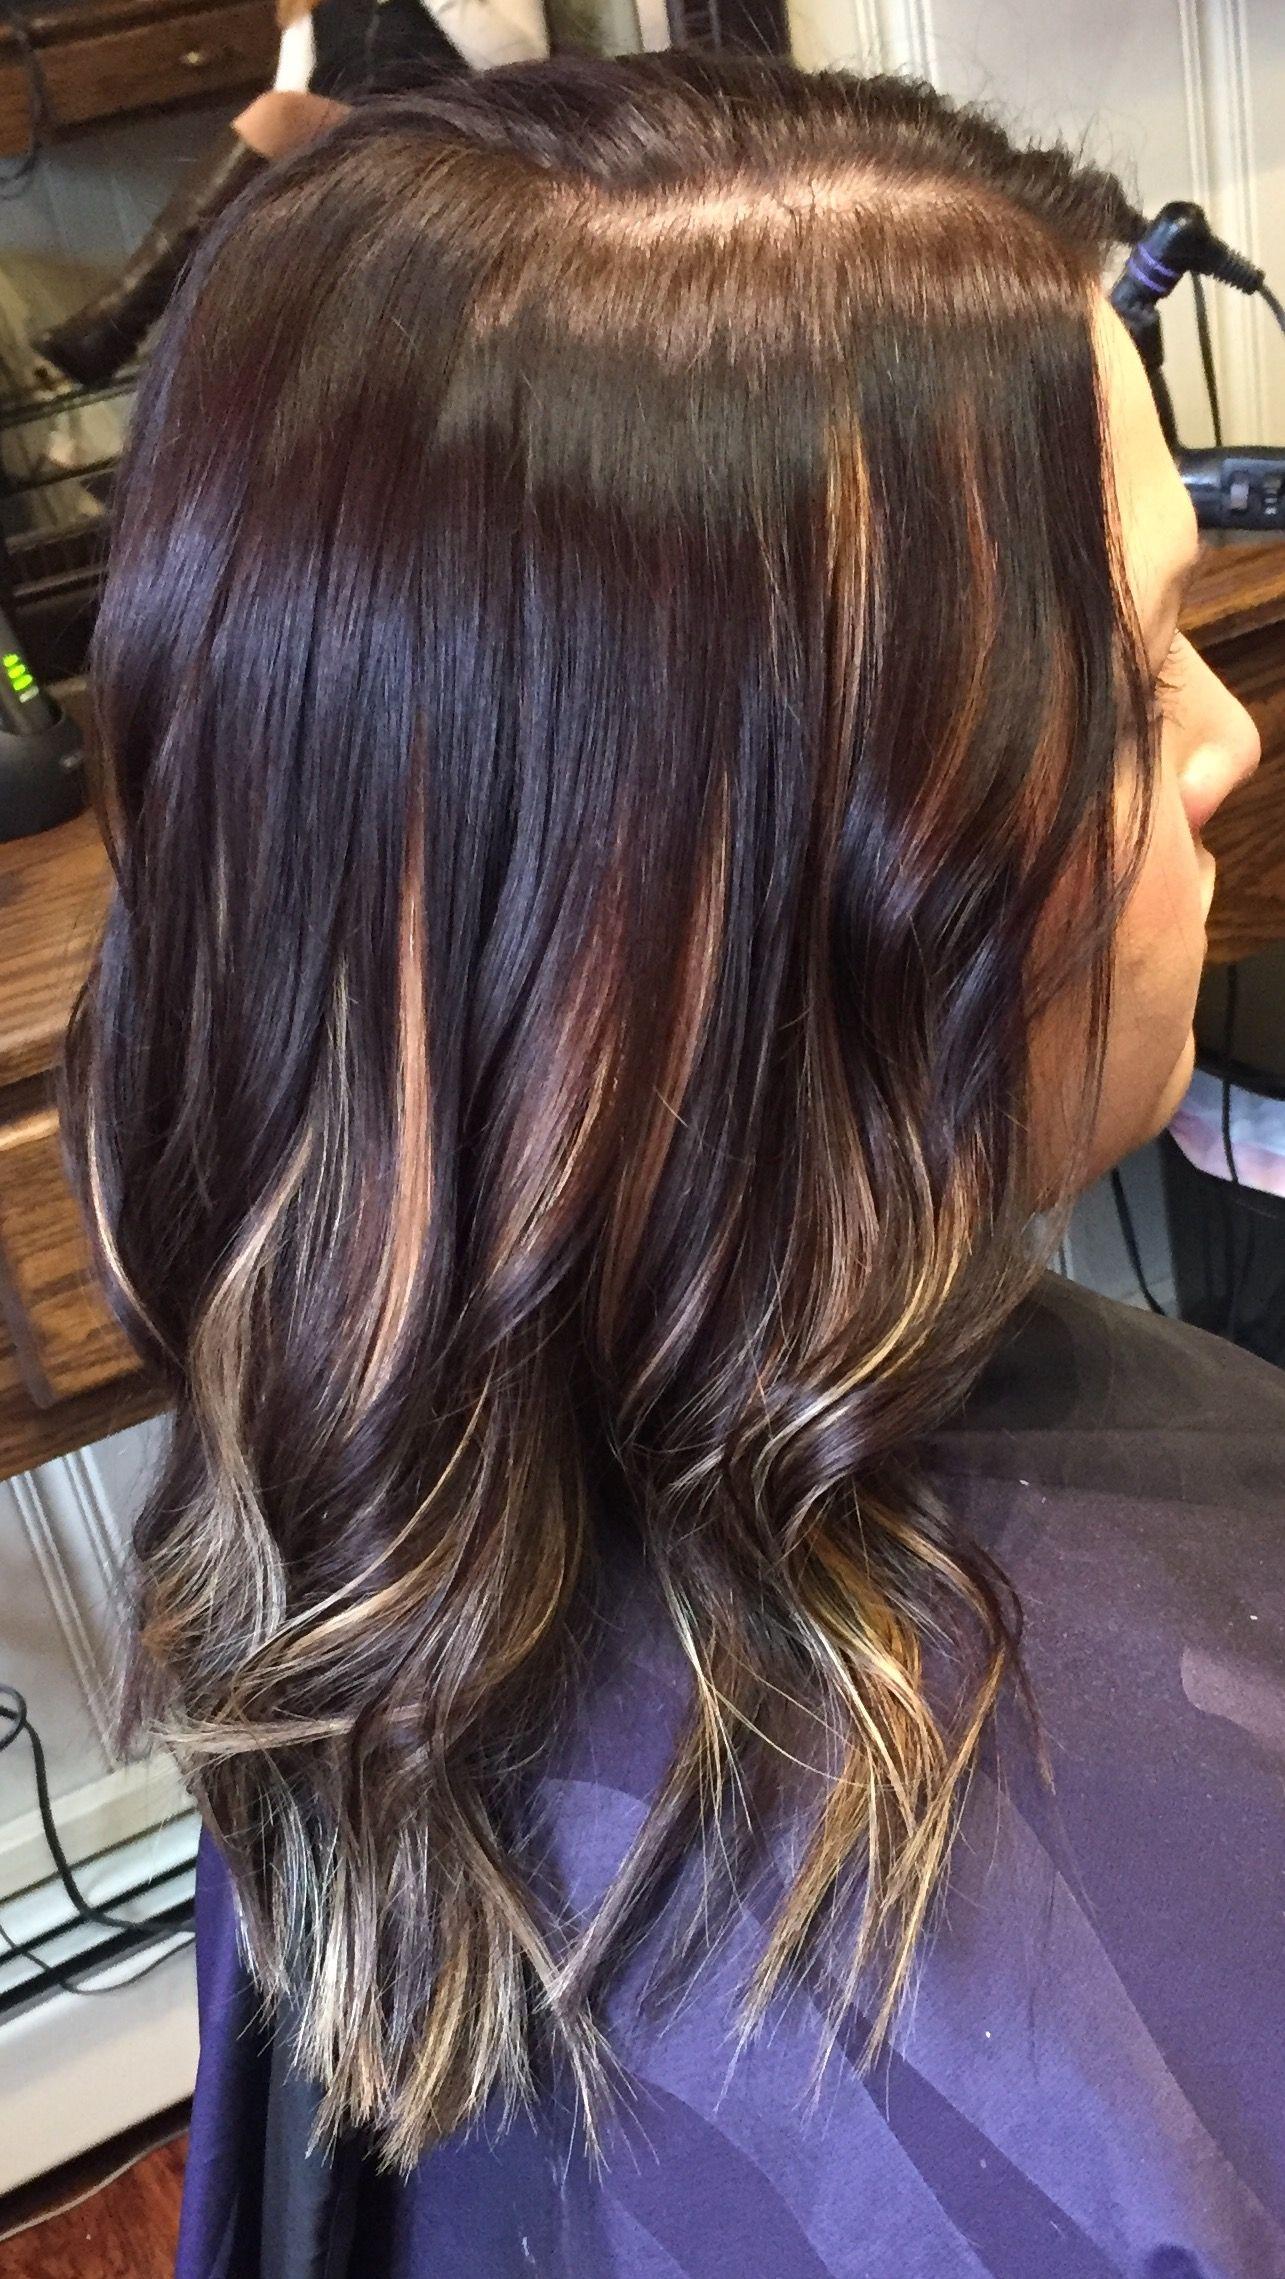 Dark Brown Hair Color With Peekaboo Light Blonde Highlights Brown Hair With Blonde Highlights Dark Brown Hair Color Light Blonde Highlights